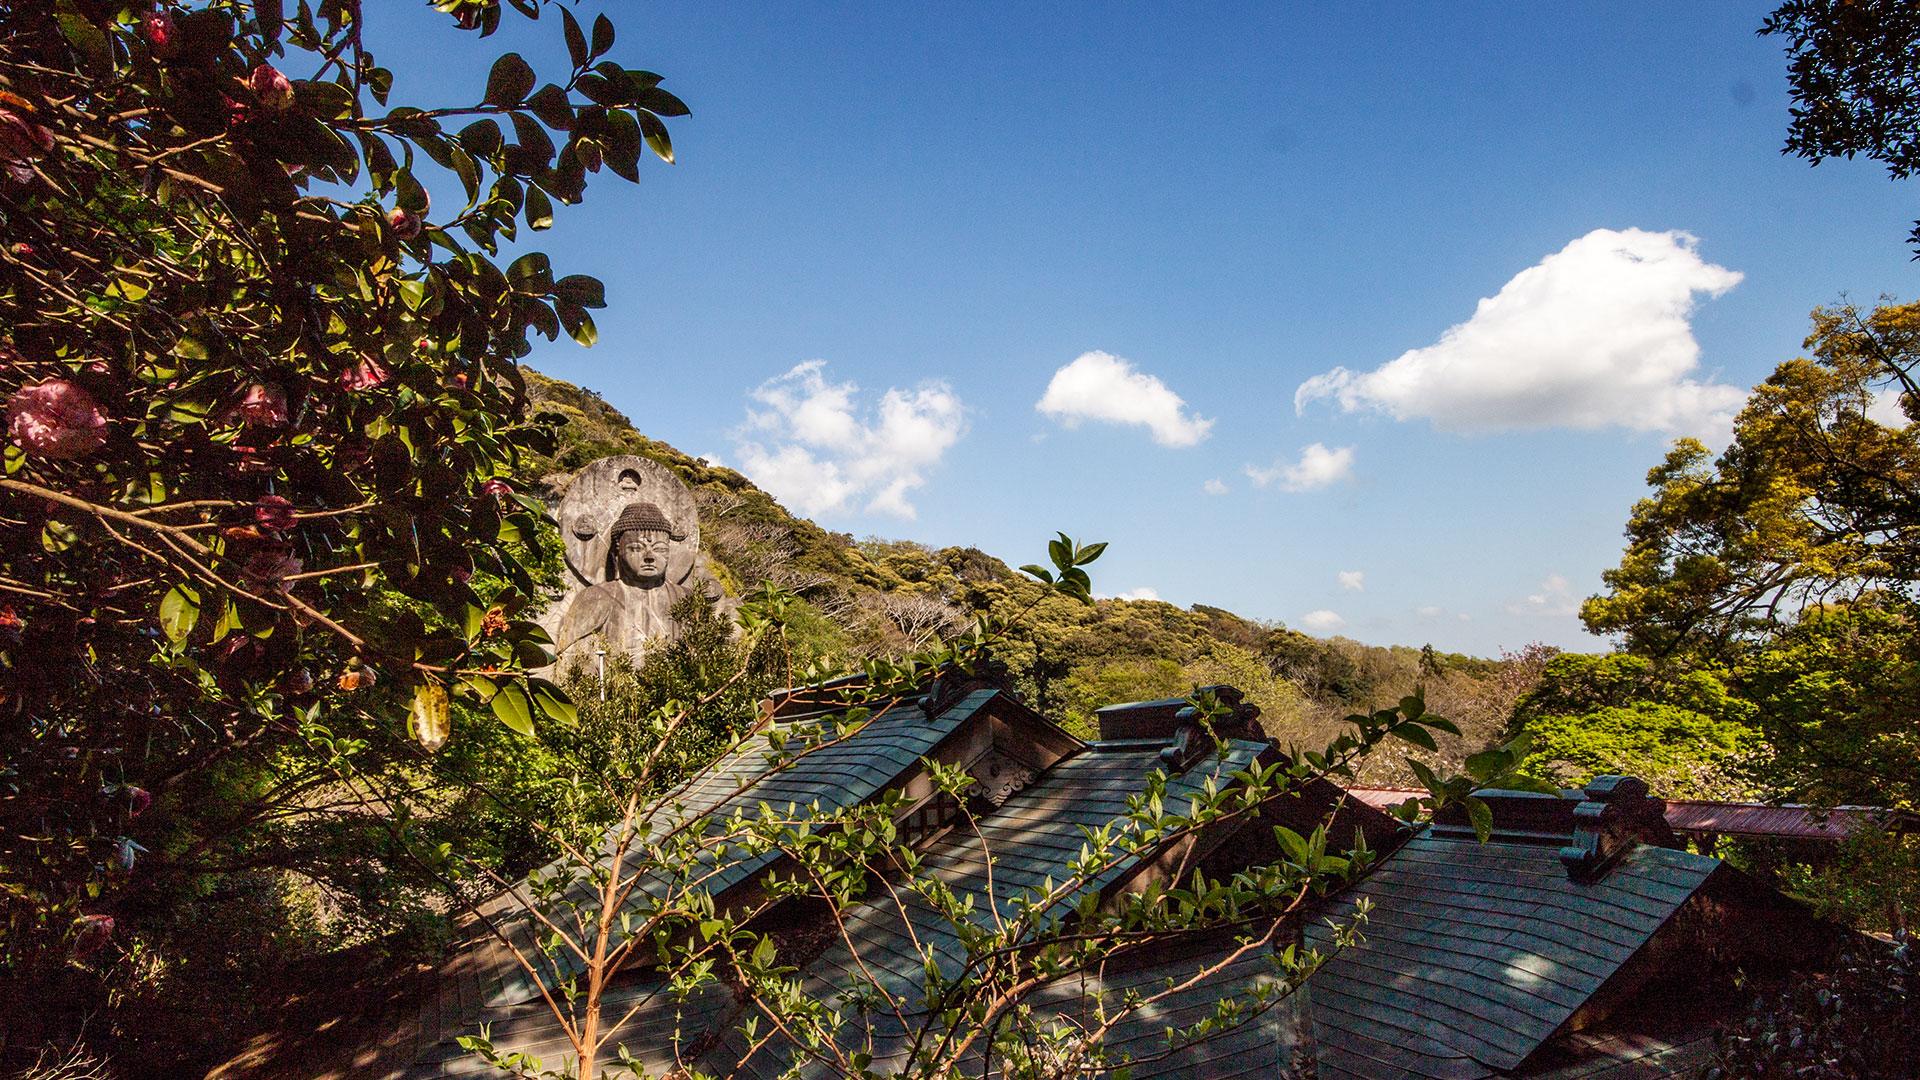 Das Highlight am Mount Nokogiri, der größte Buddha Japans